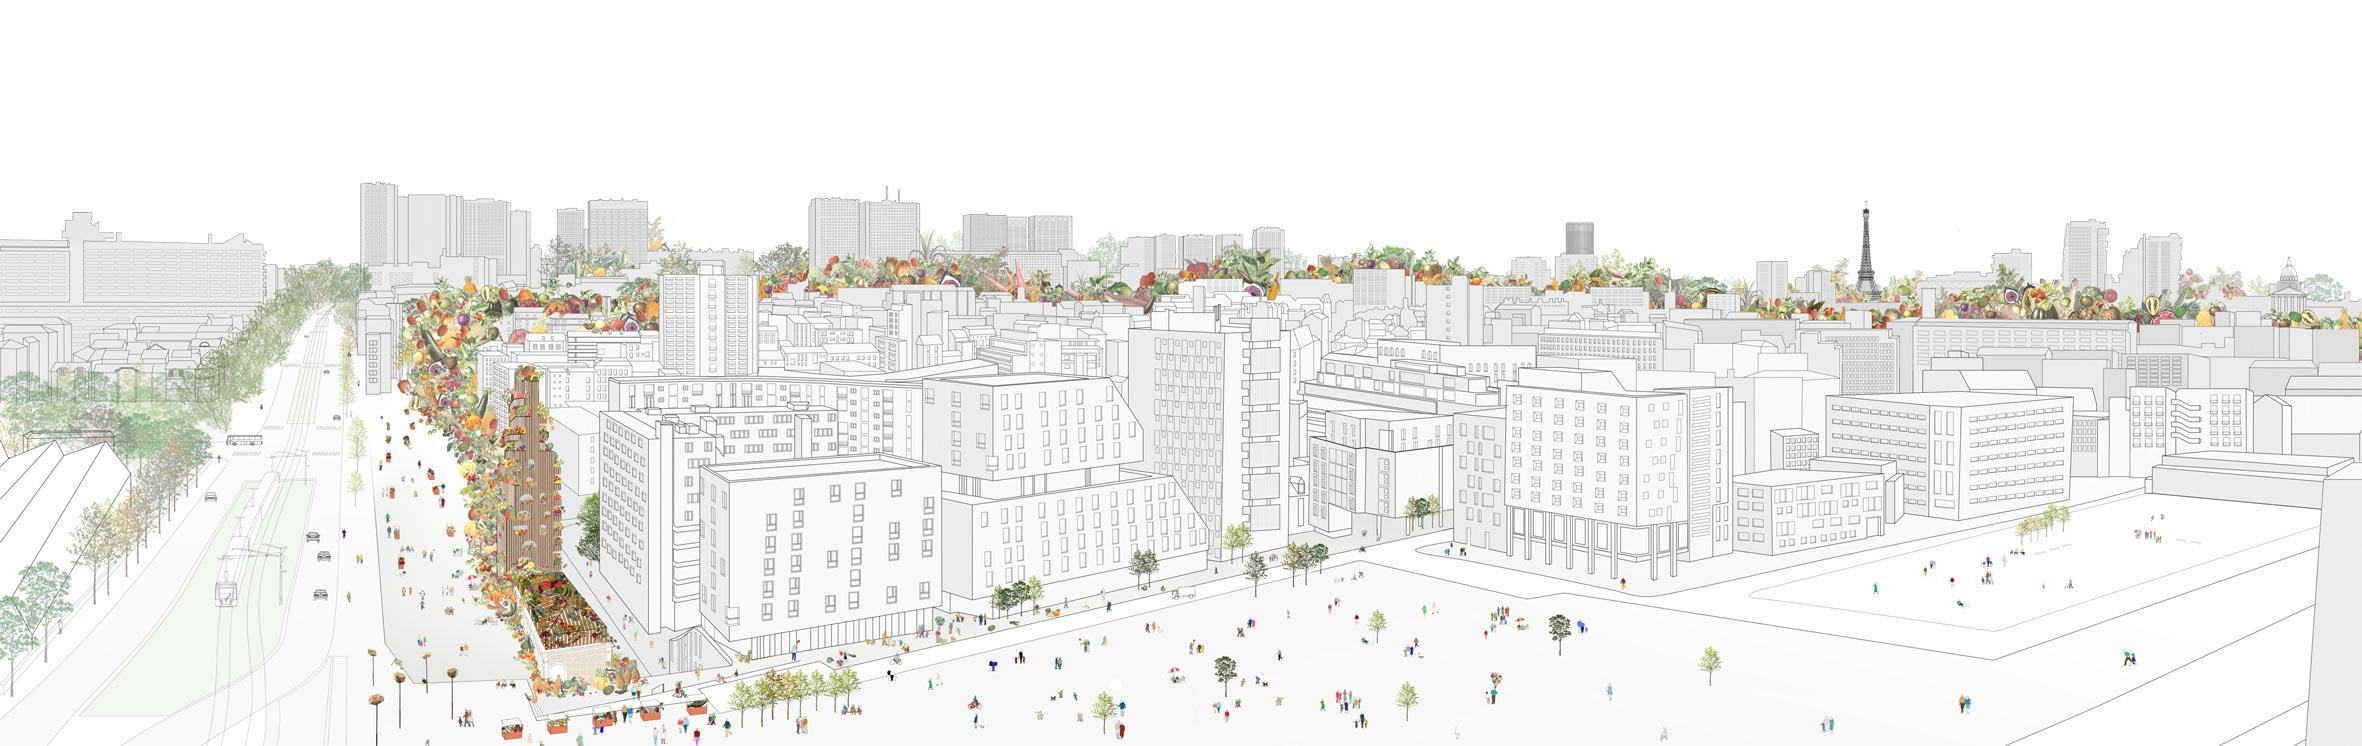 Panorama-paris-20151113-FINAL.jpg